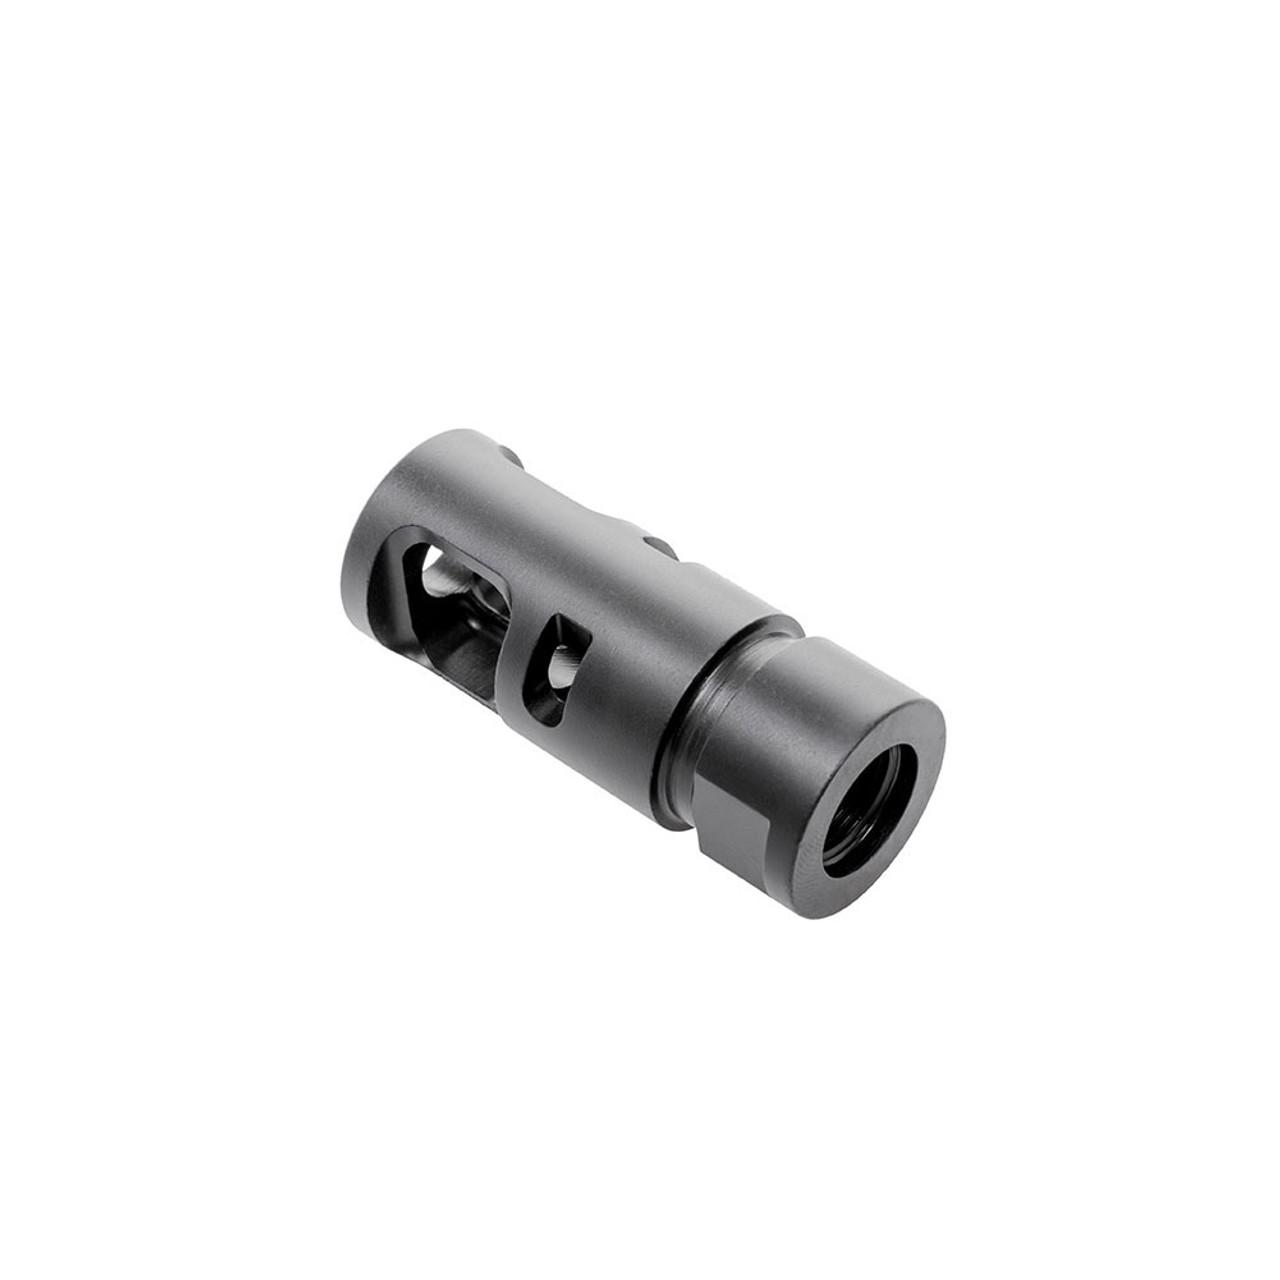 CMMG SV 1/2x28 Muzzle Break (55DA577)